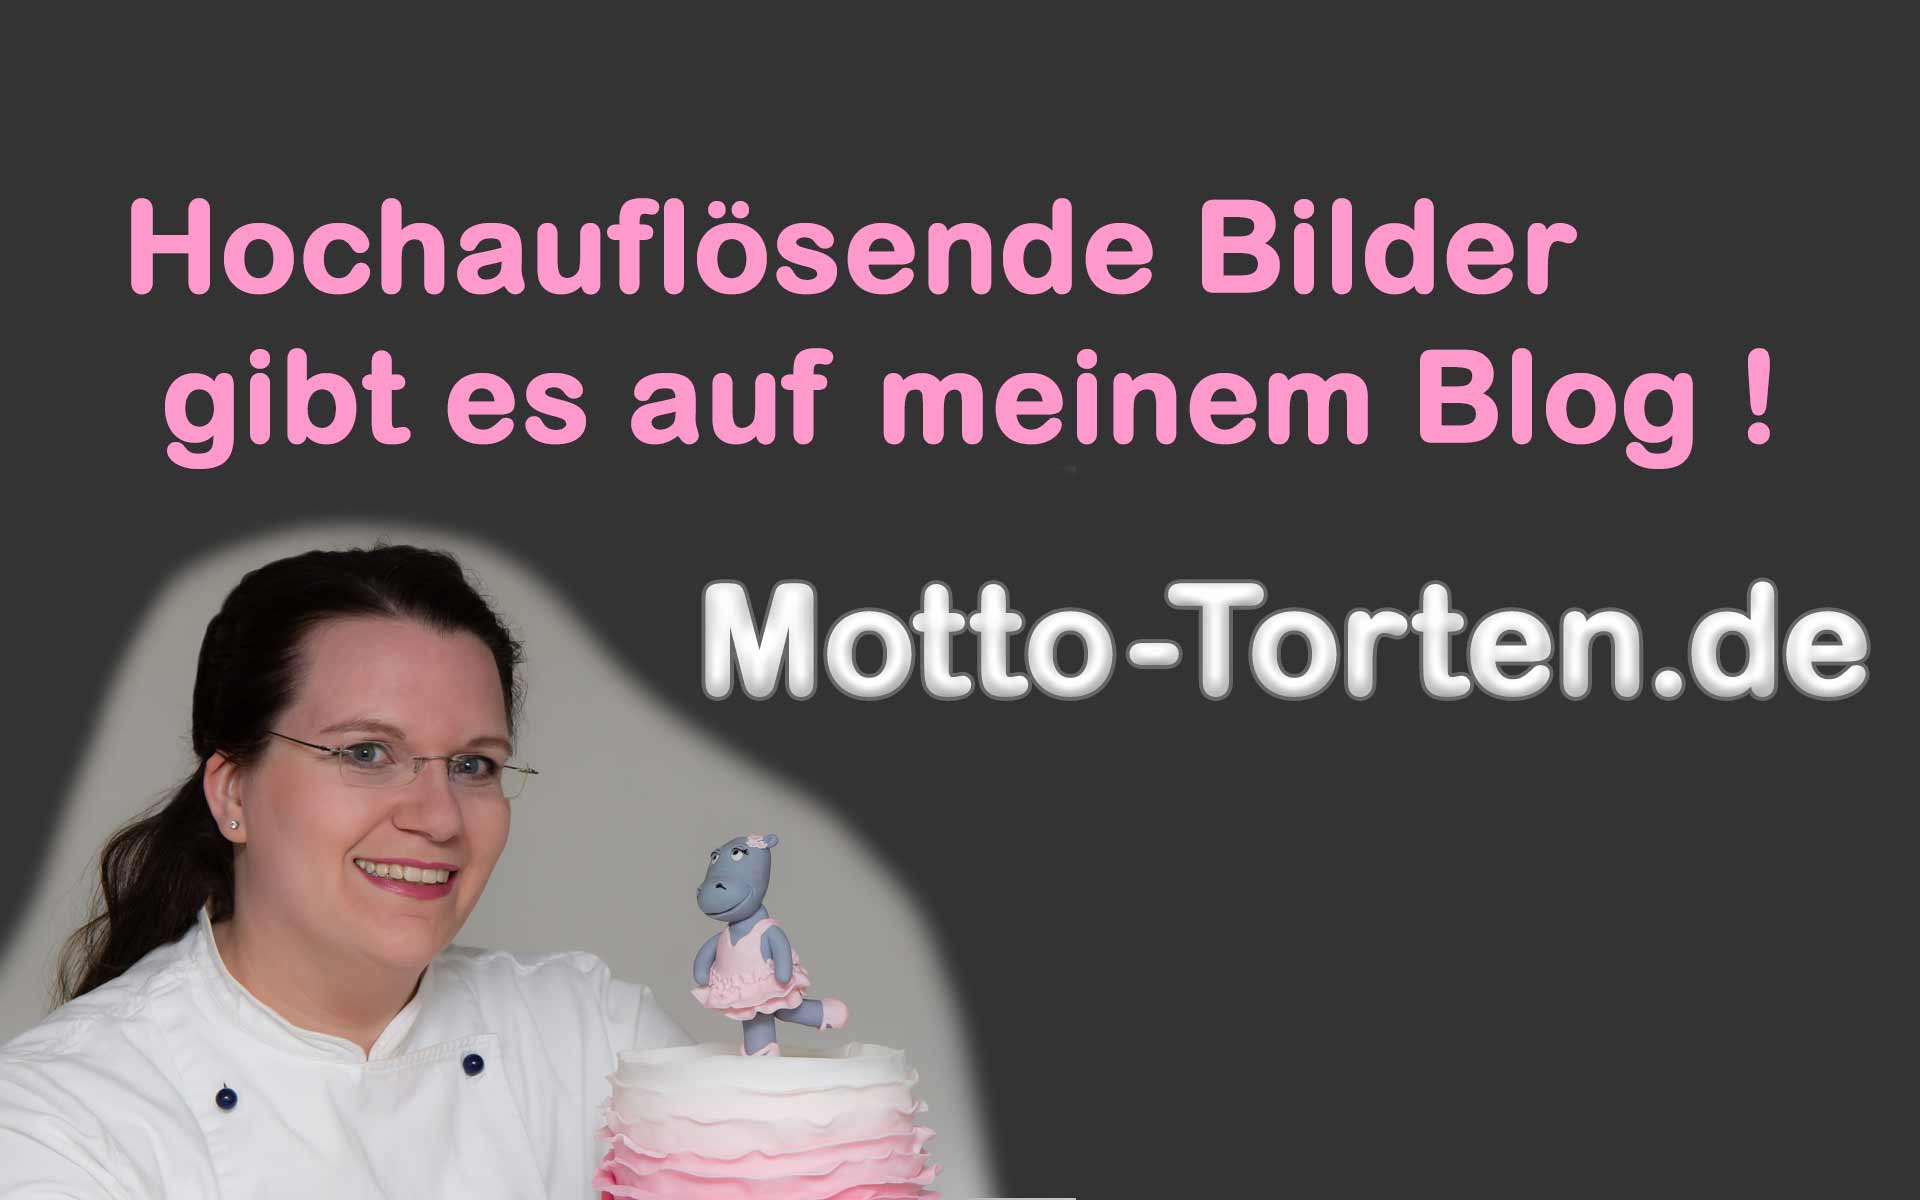 Abschlepper Torte